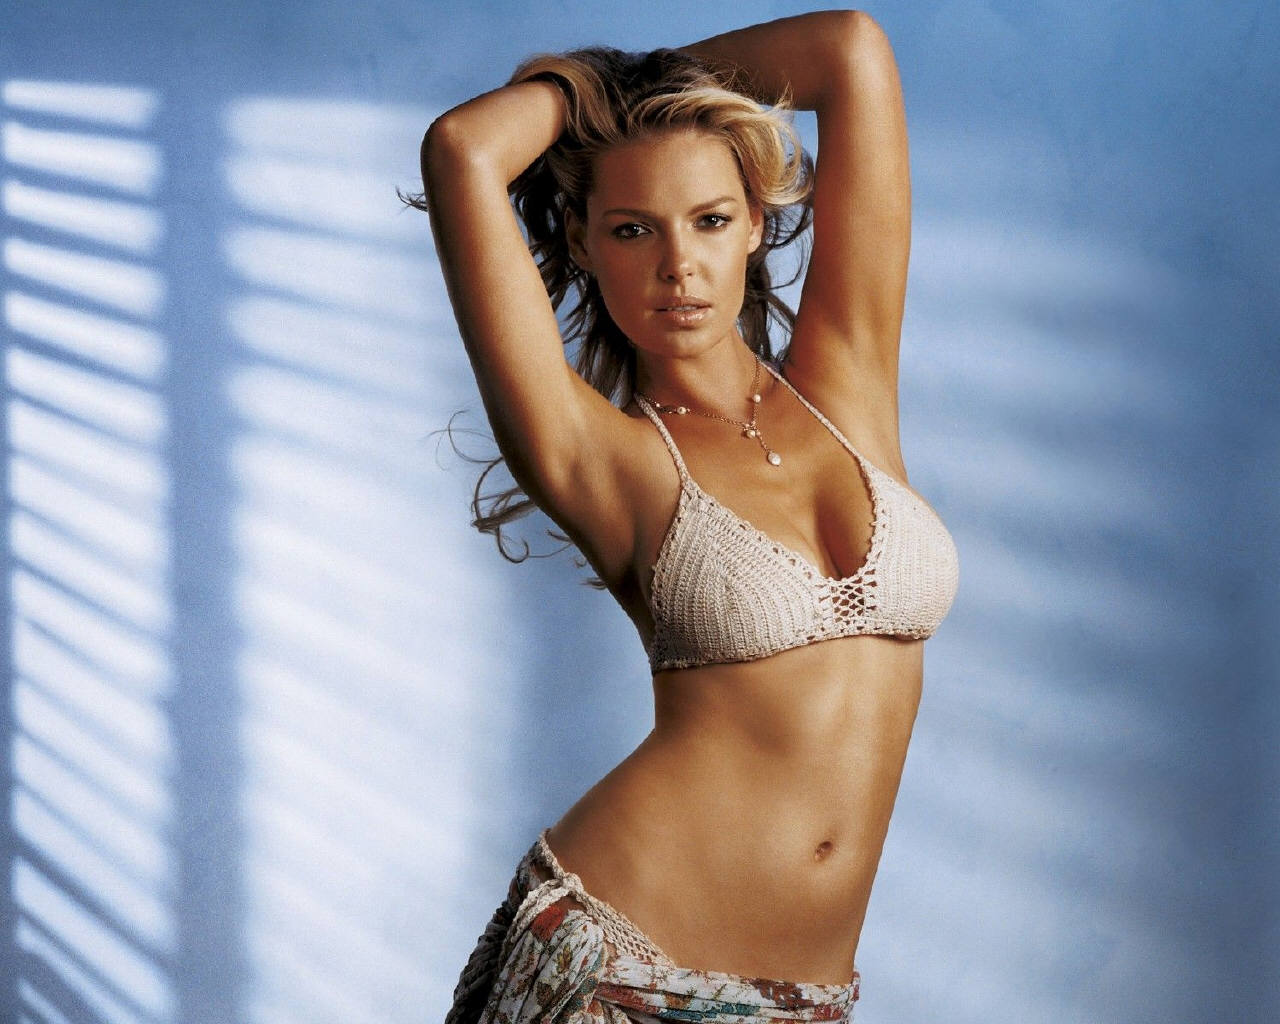 Katherine heigl фото голая Вам